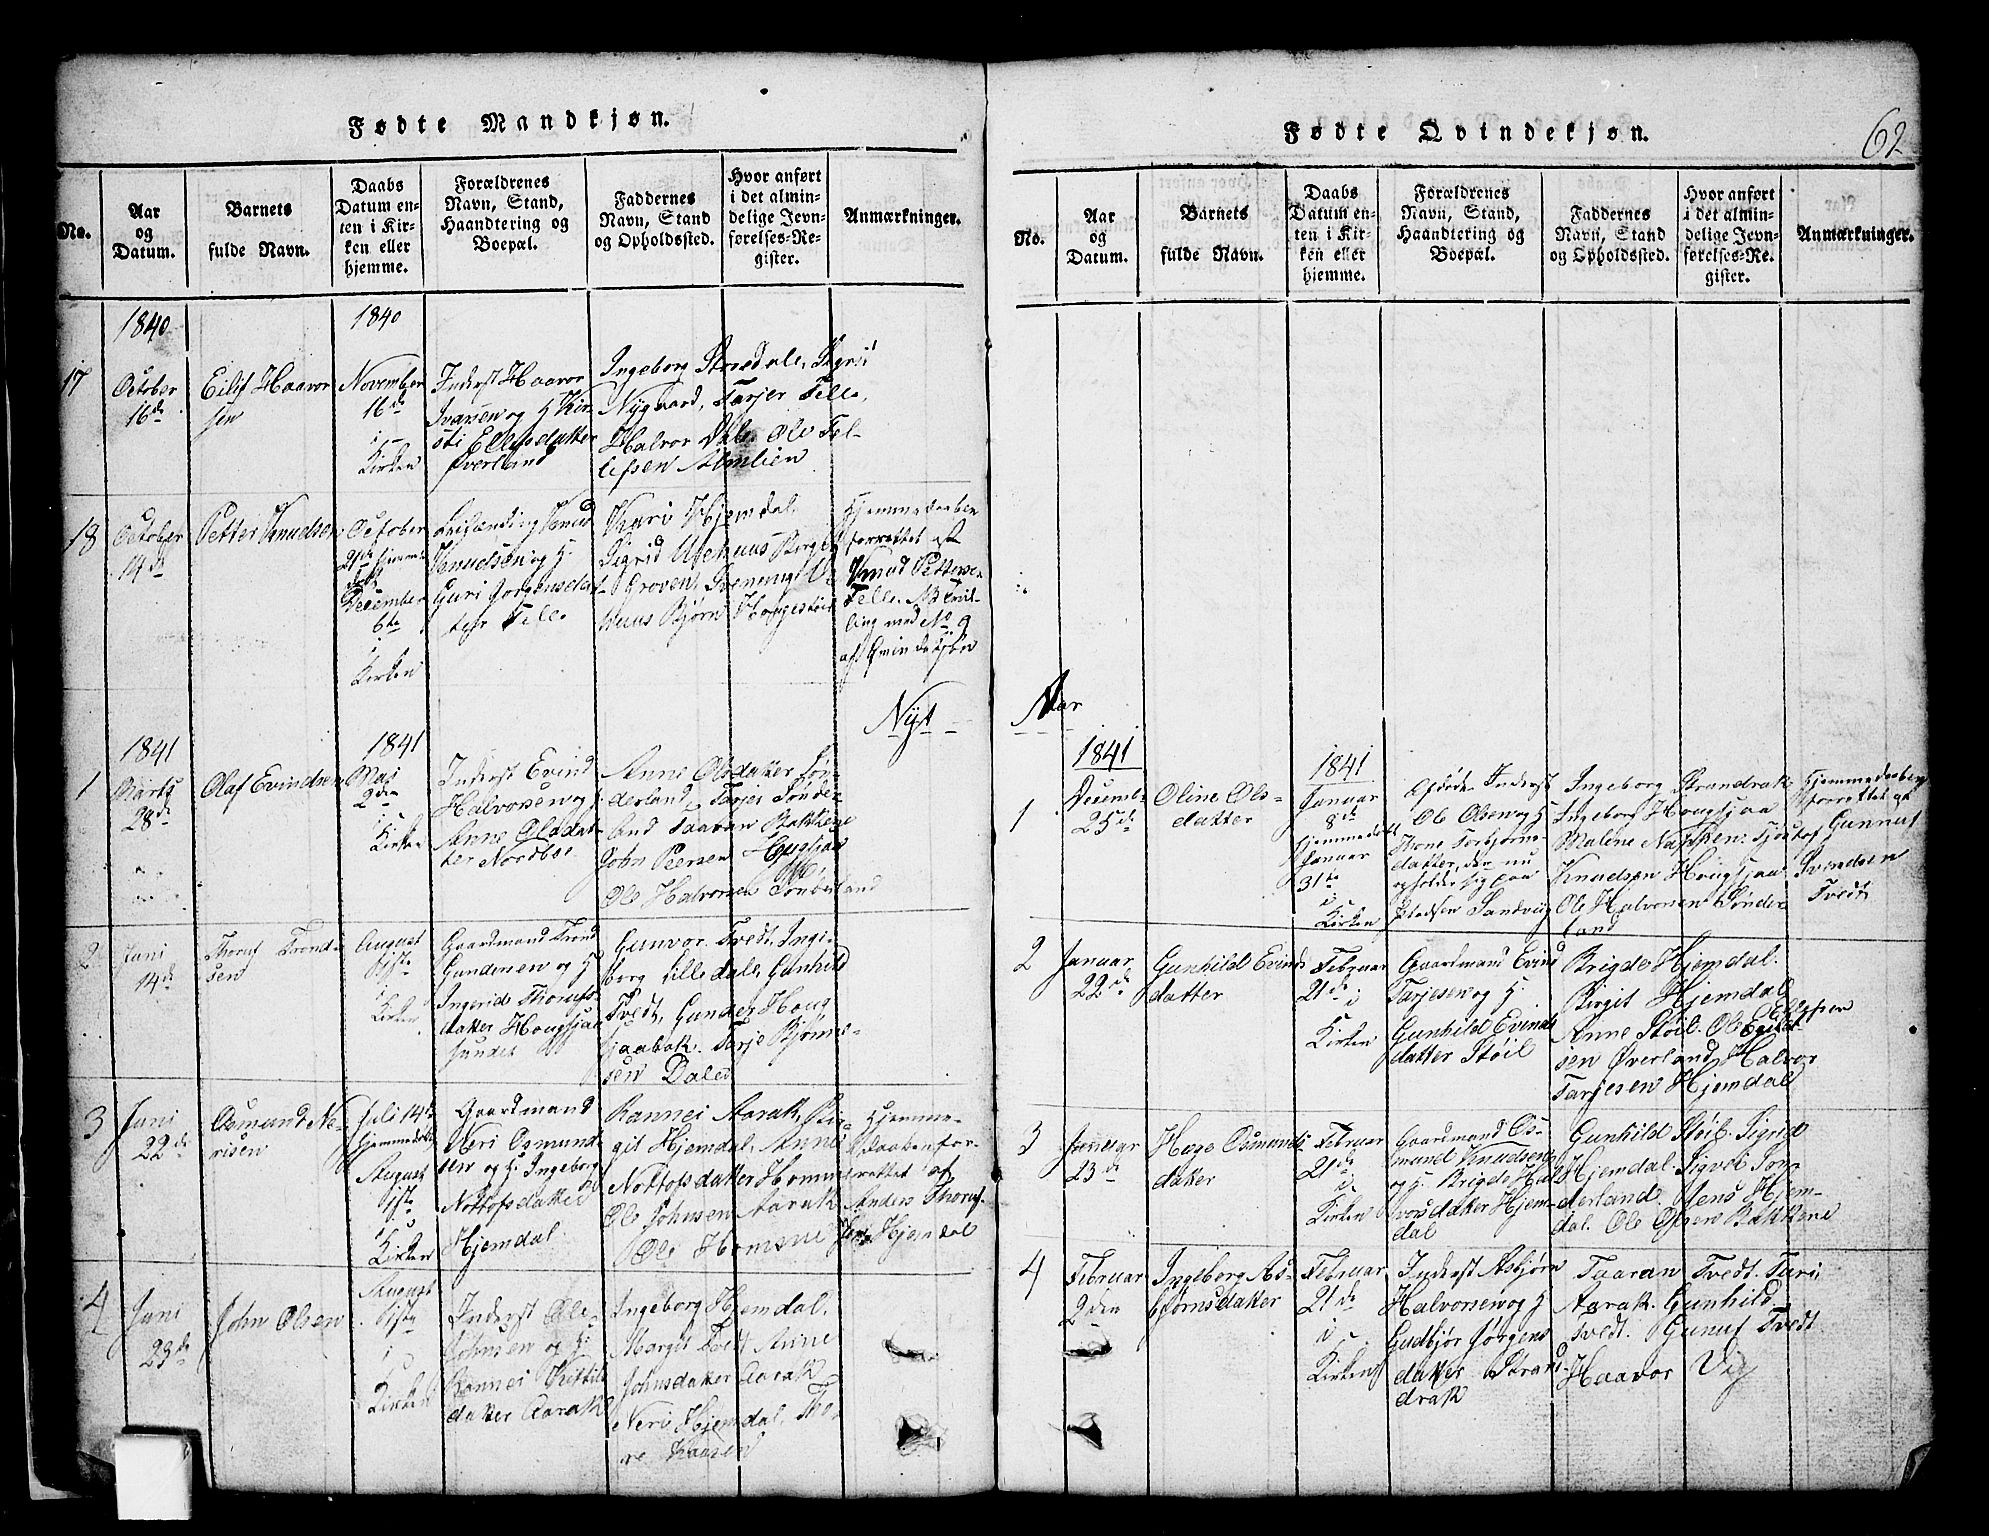 SAKO, Nissedal kirkebøker, G/Gb/L0001: Klokkerbok nr. II 1, 1814-1862, s. 62